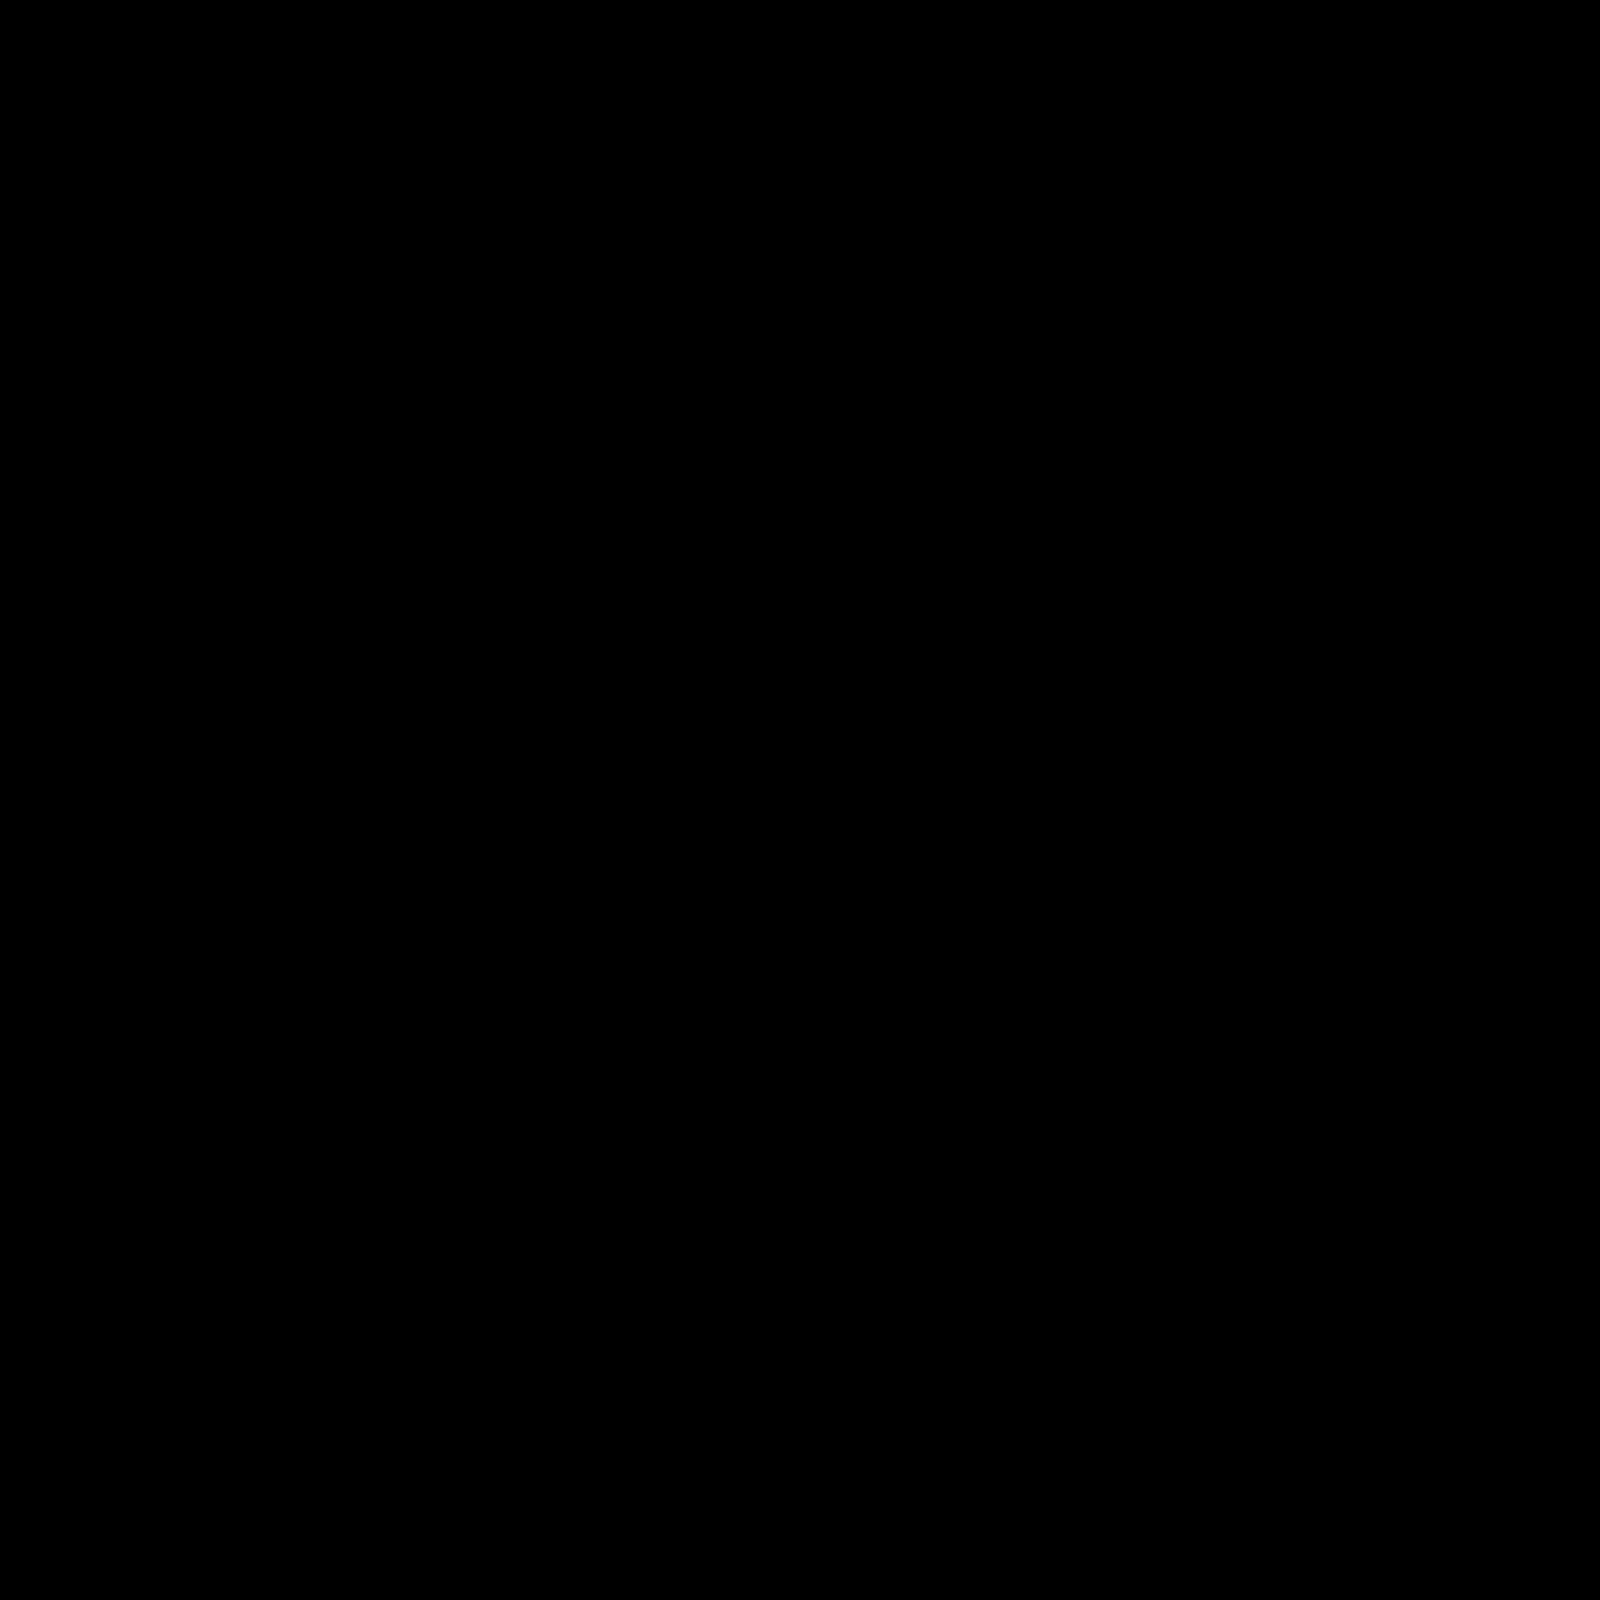 Hockey Ball Filled icon